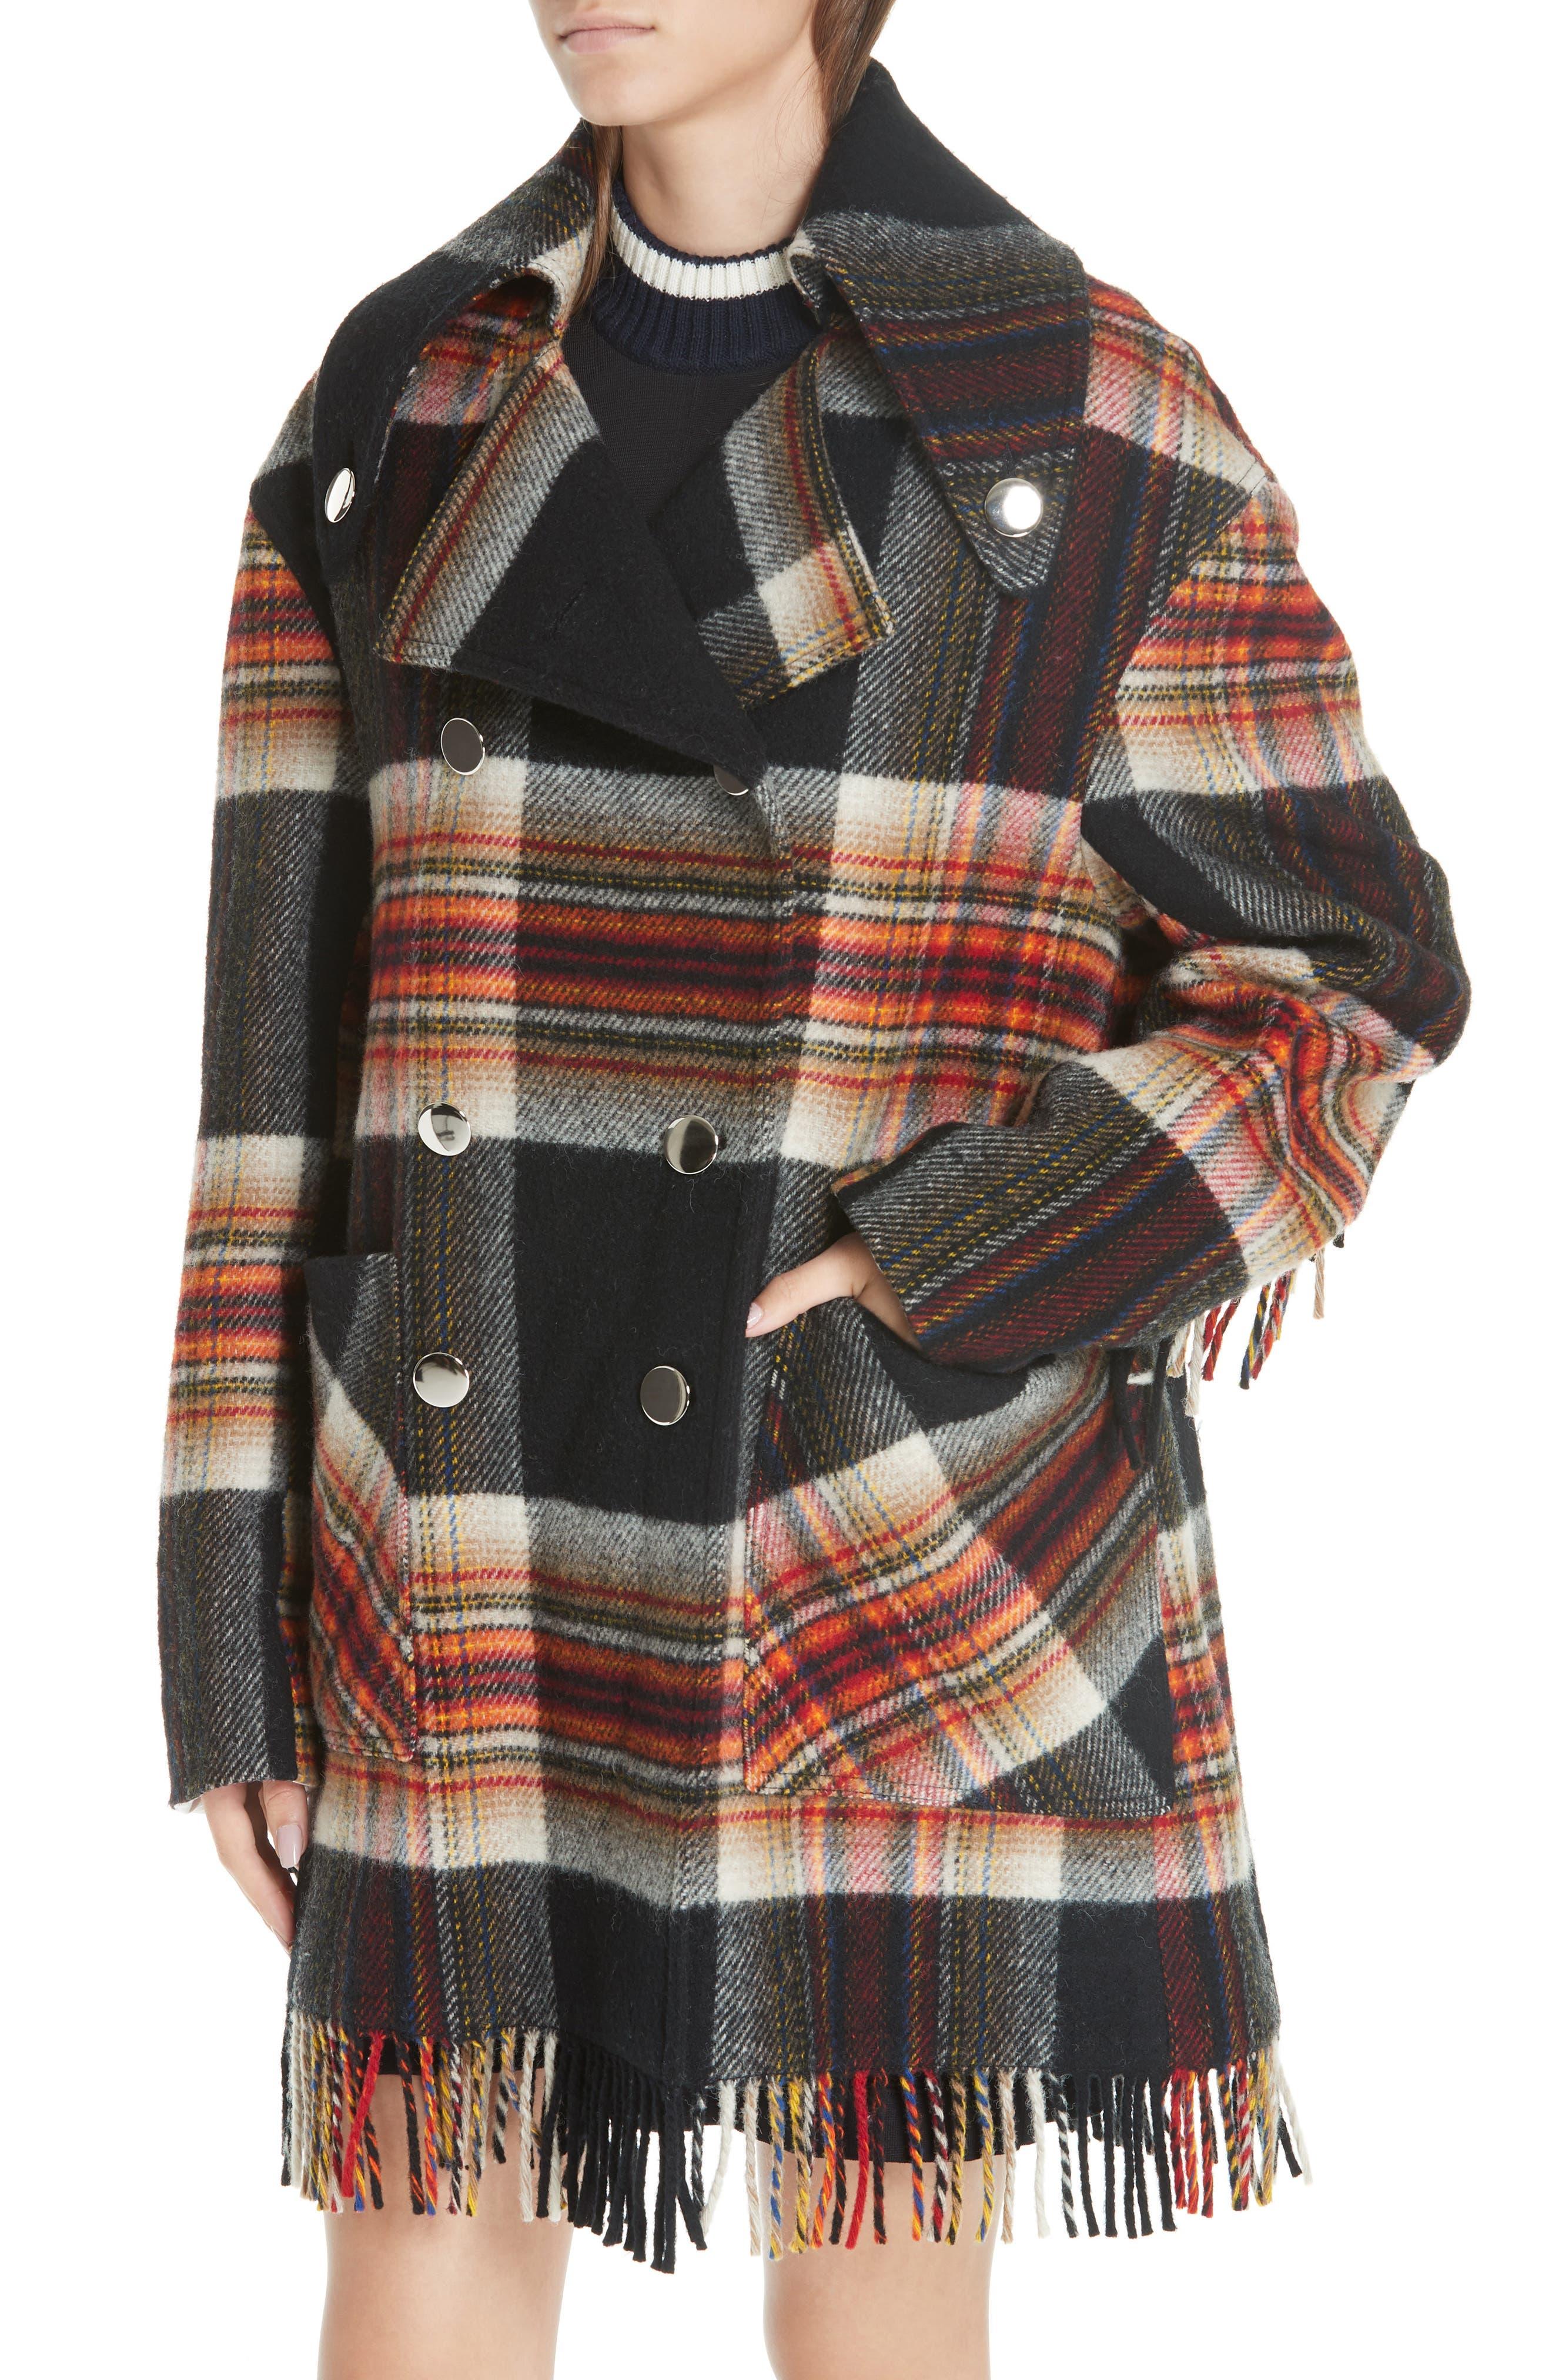 x Pendleton Fringe Plaid Blanket Coat,                             Alternate thumbnail 4, color,                             001